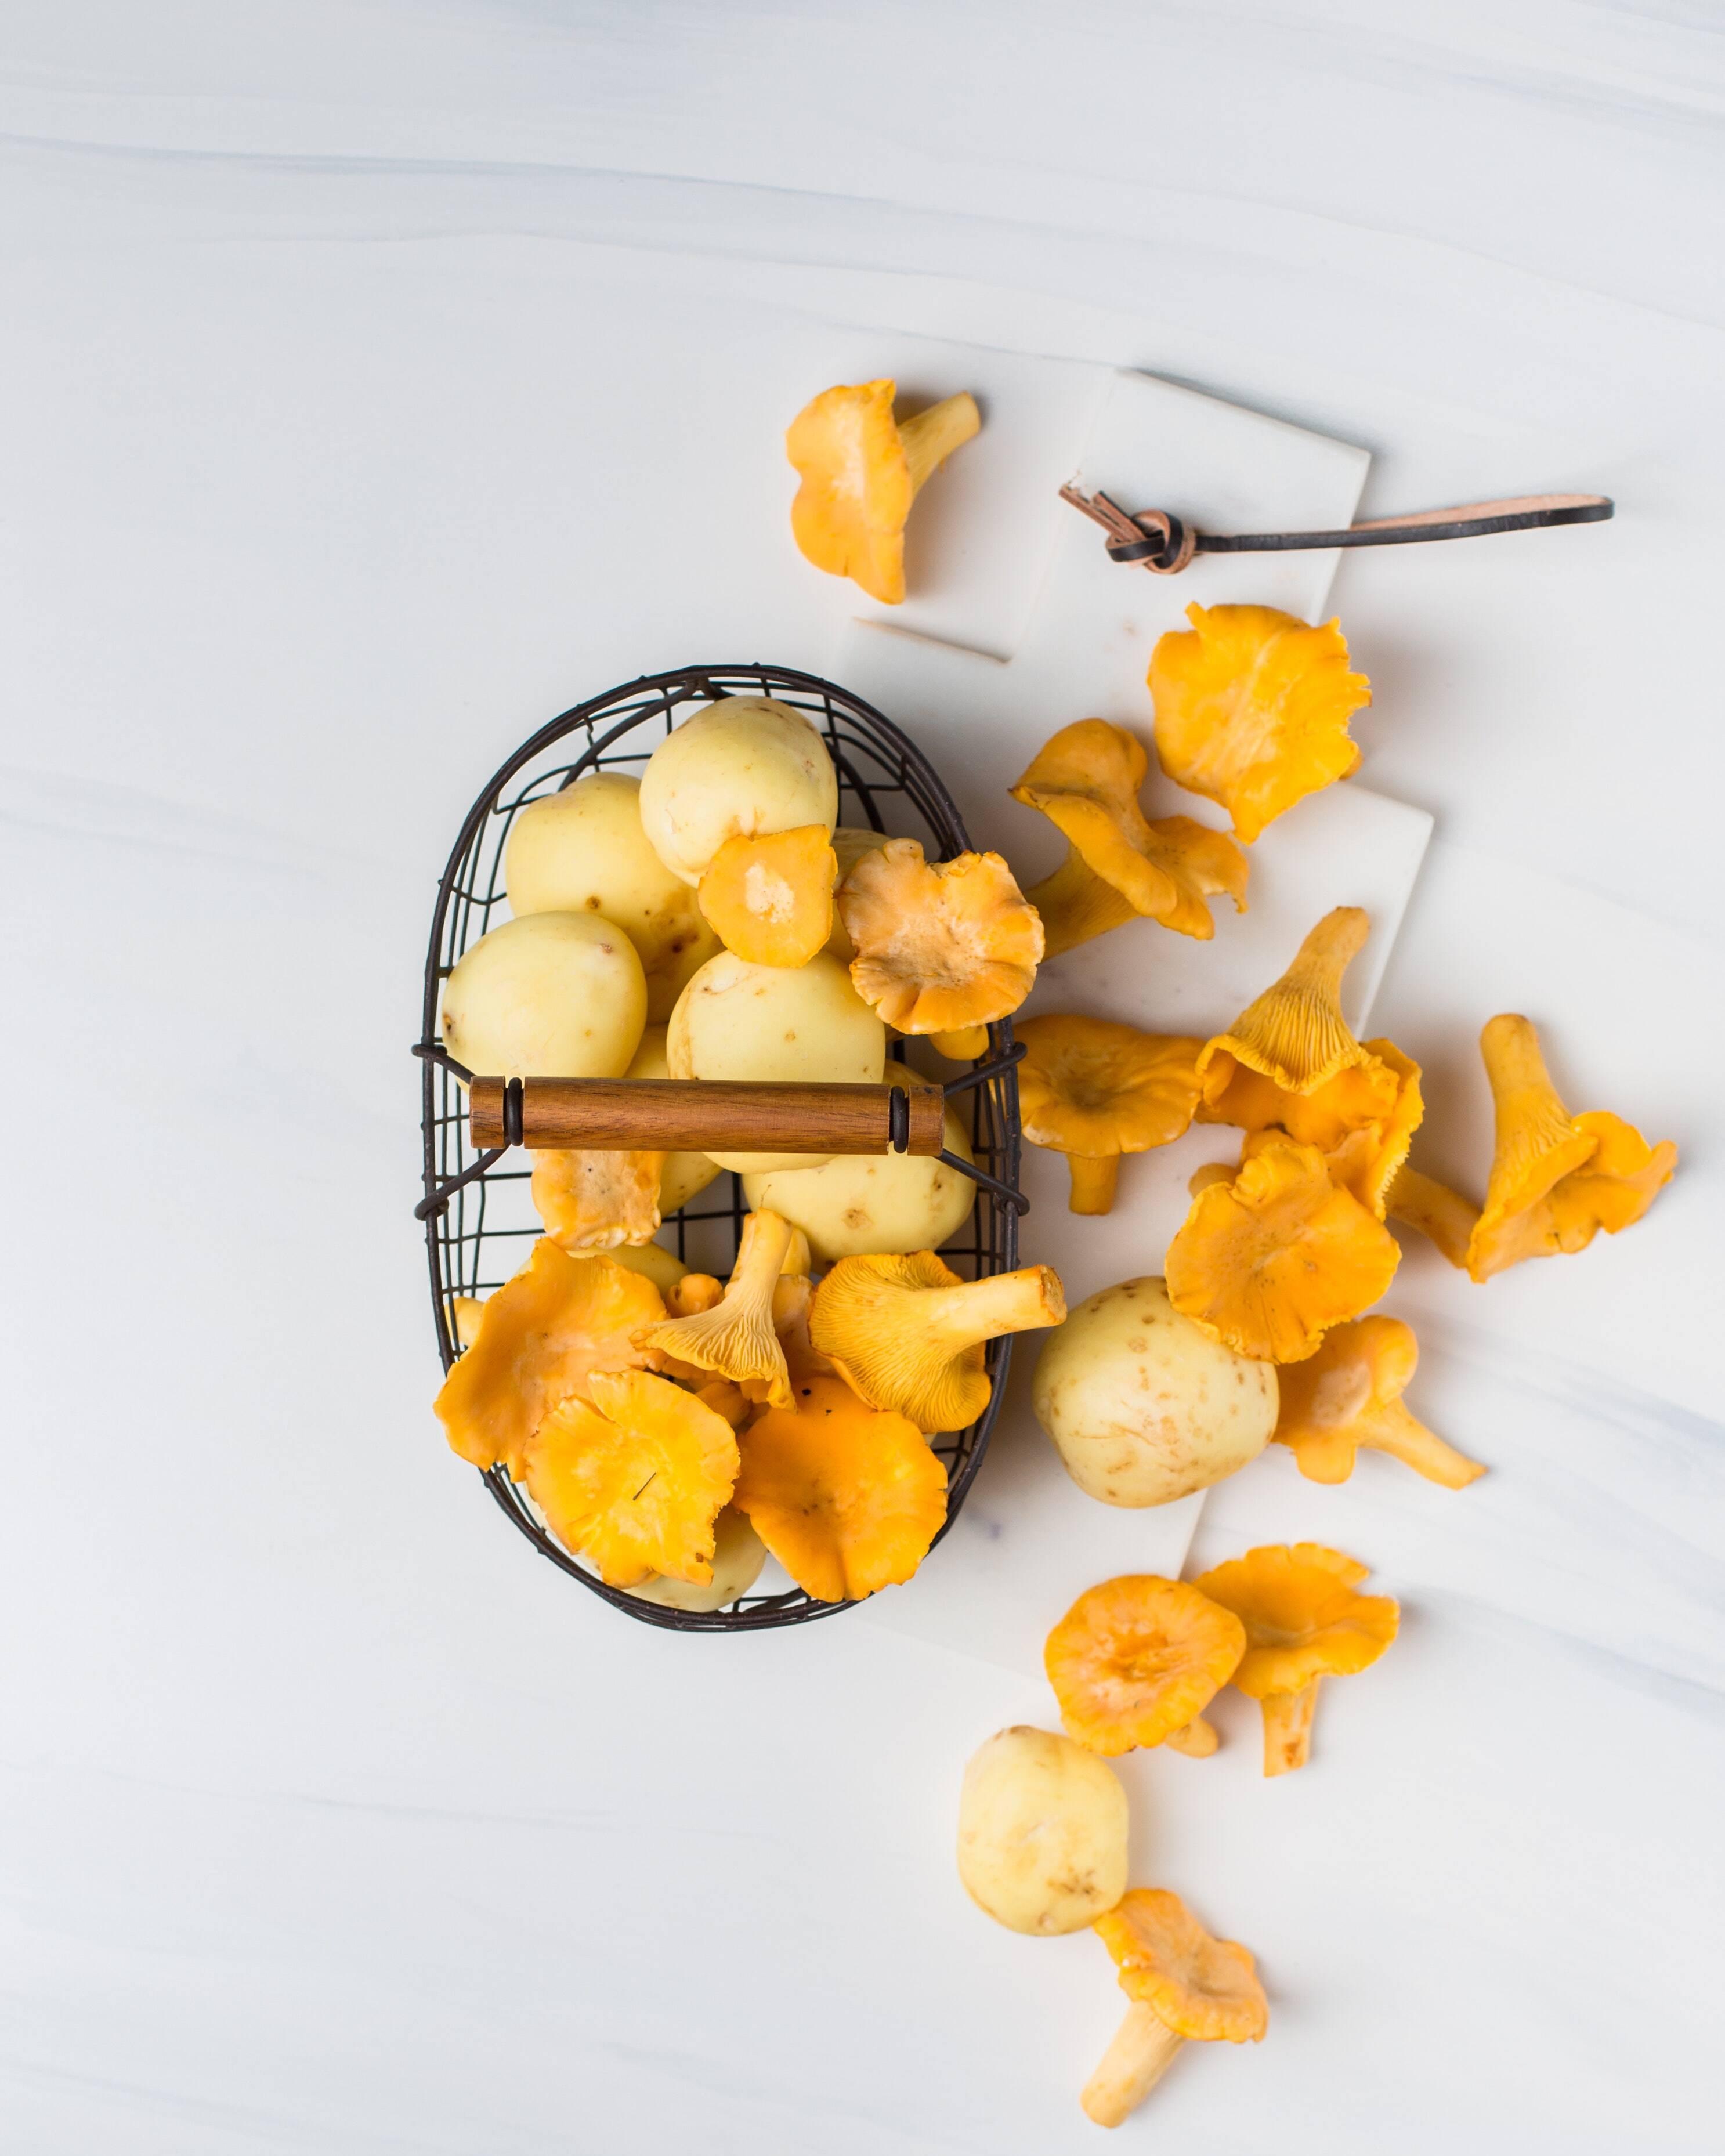 4 Cogumelos gigantes; 1 lata de anchovas; 1 ralado tomate; 2 Fatias de queijo muçarela; 1 / 4 de cebolas cortadas em juliette; azeitonas pretas; Orégano, pimenta e sal. (Foto: Pexels)